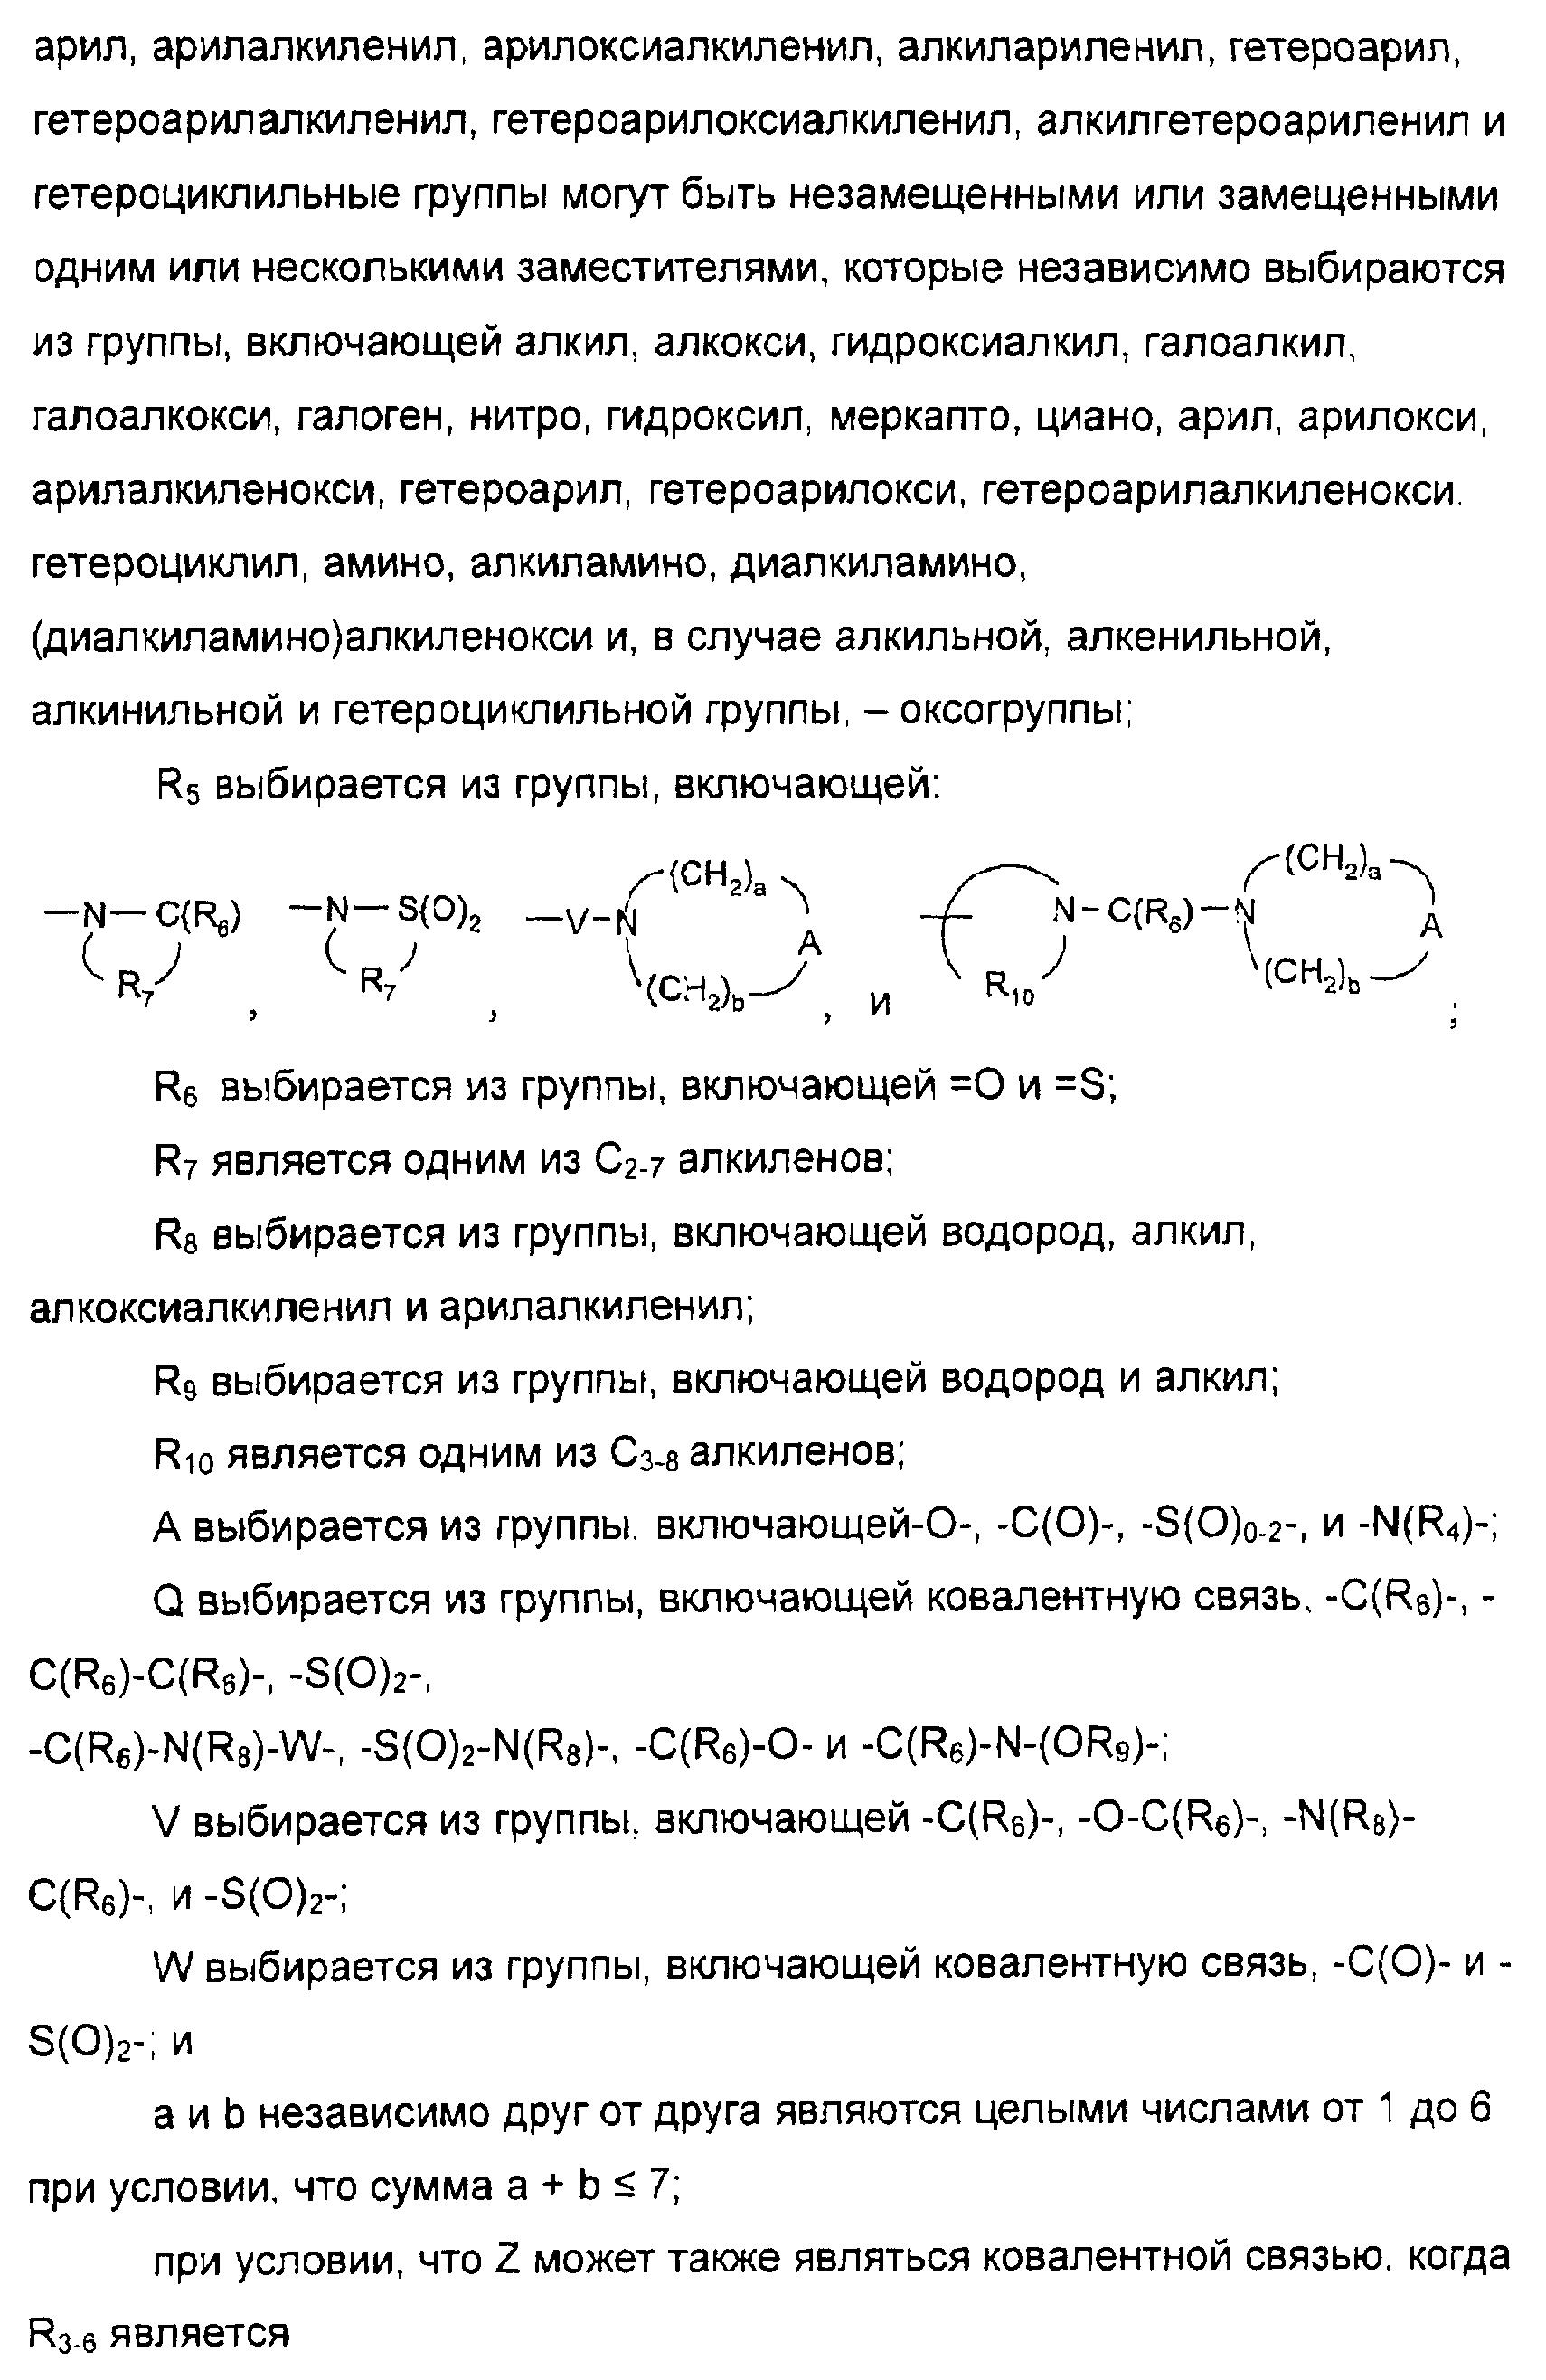 Figure 00000036